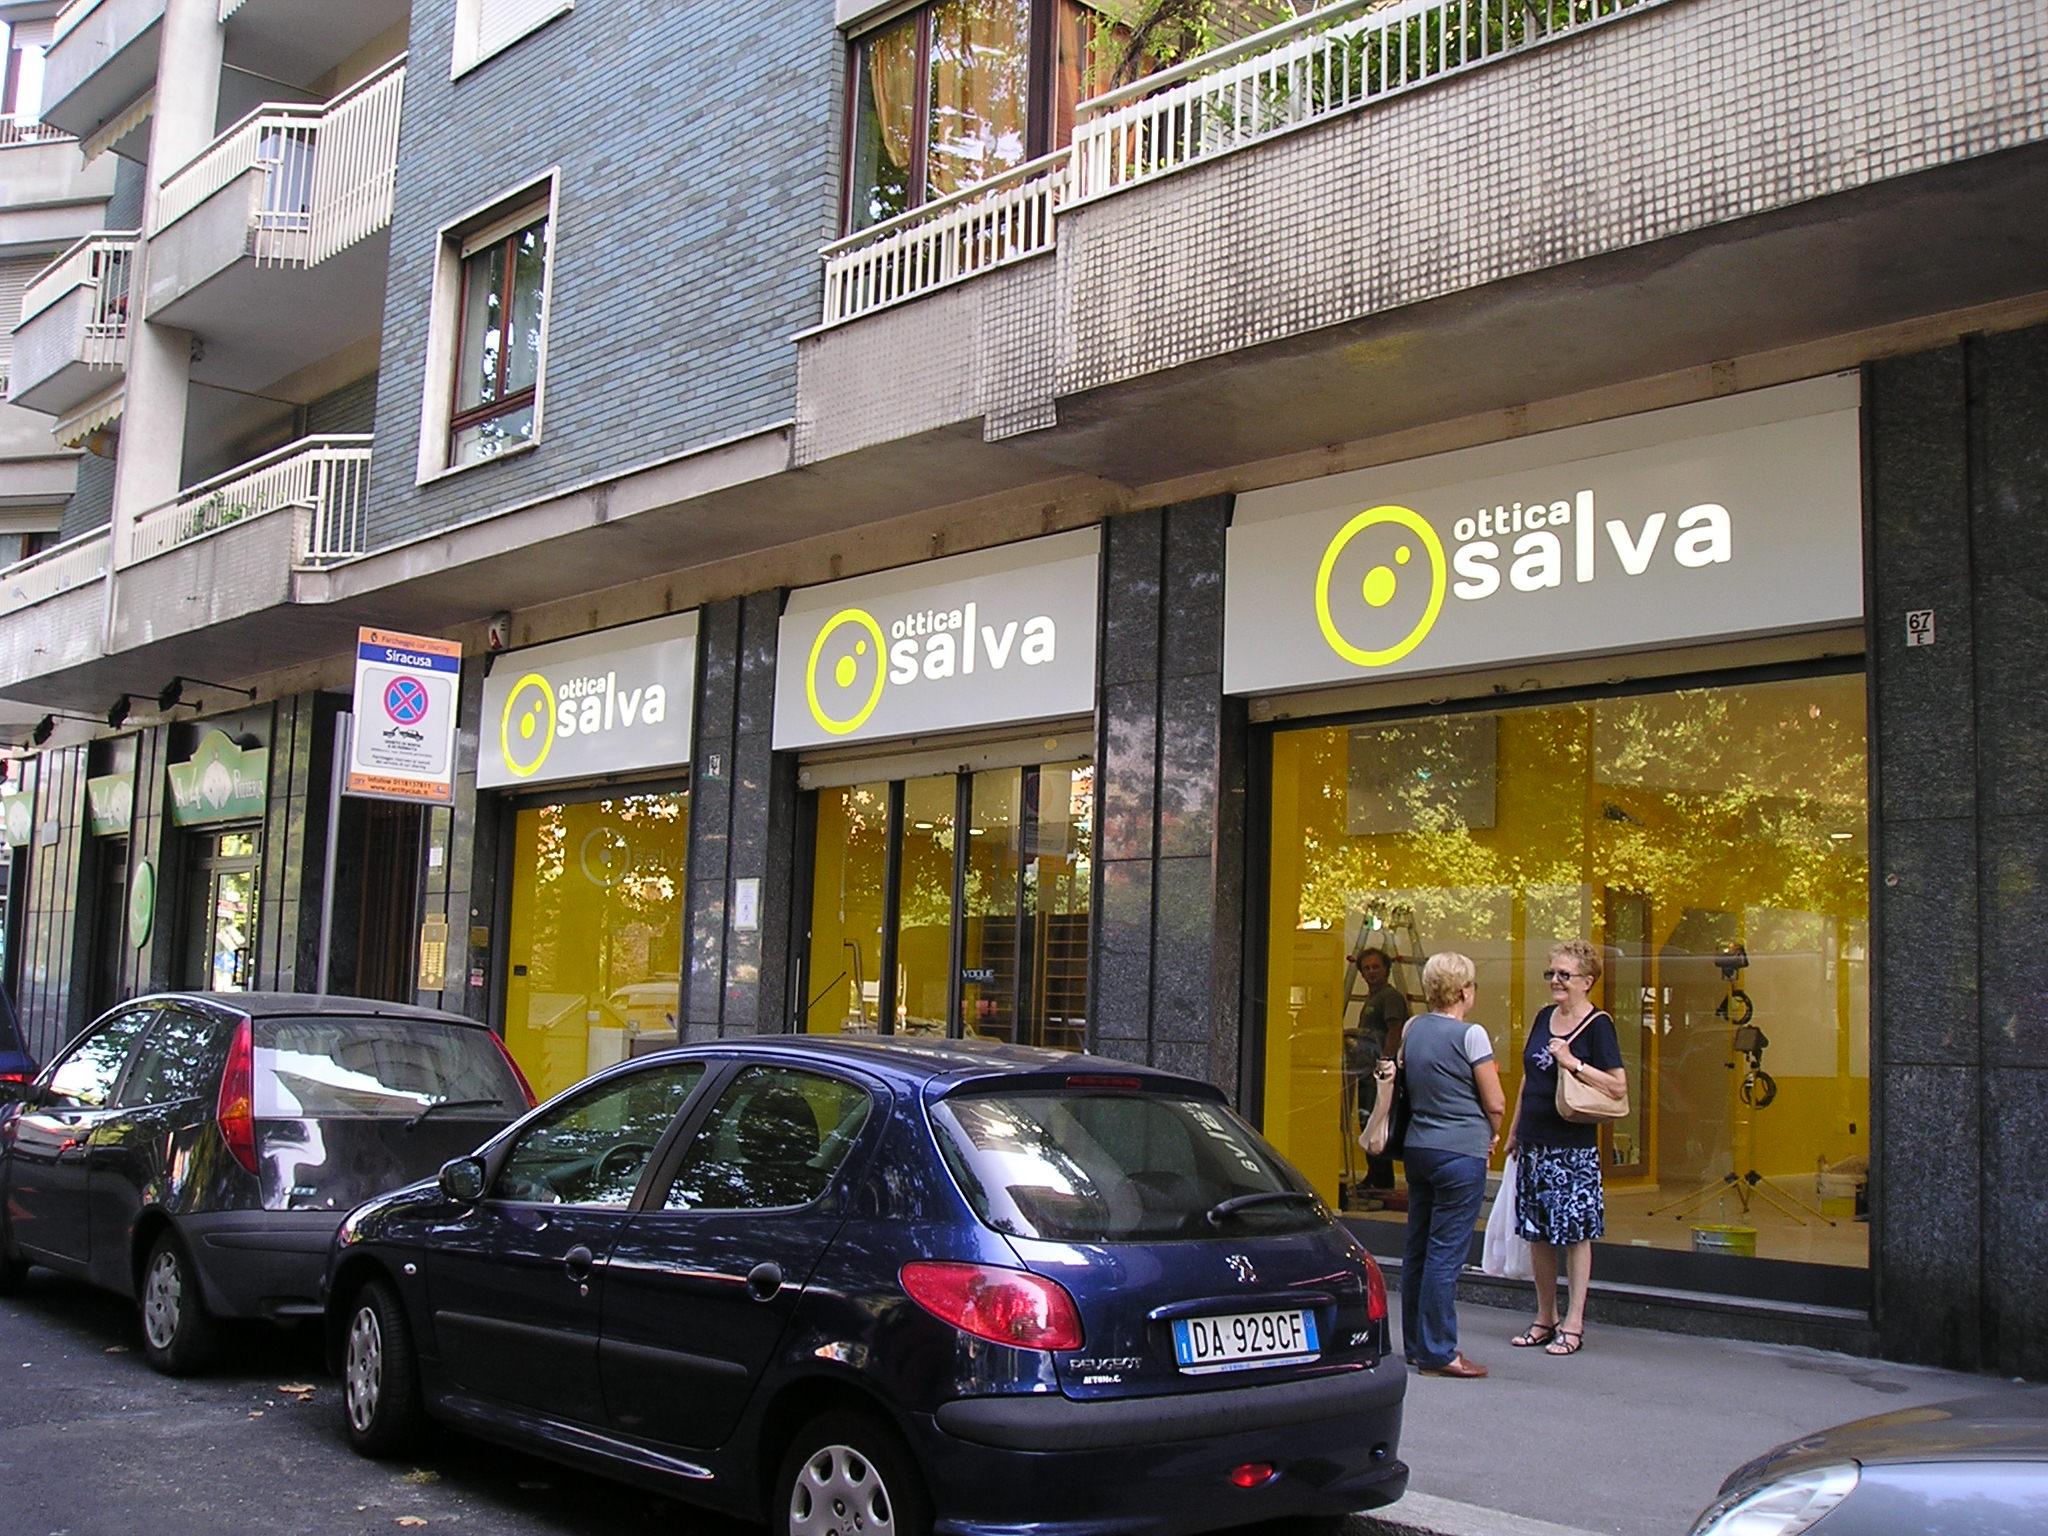 Insegne Ottica Salva Torino